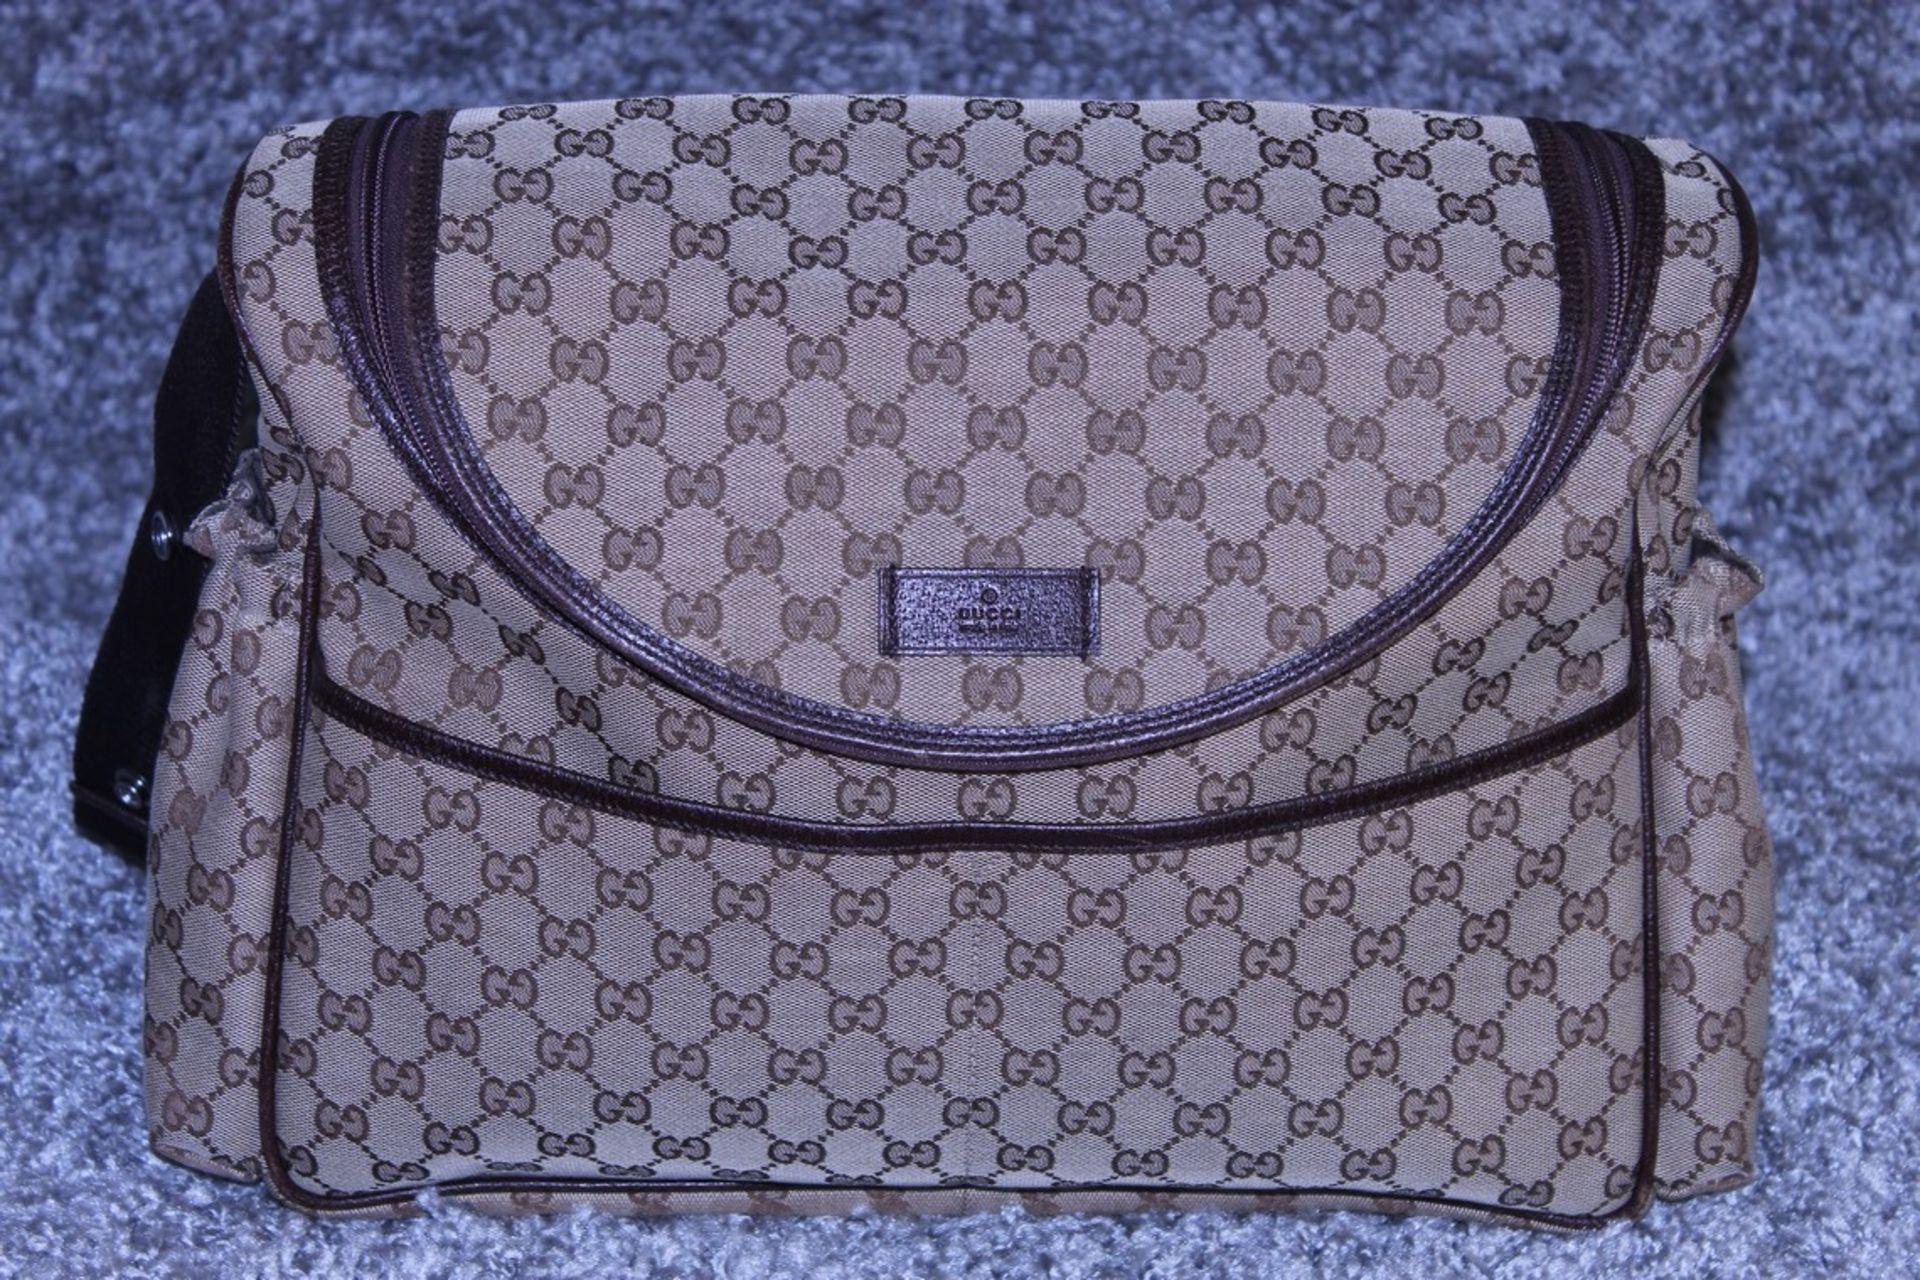 RRP £1,200 Gucci Original Diaper Bag, Beige/Dark Brown Monogramme Canvas, 36X28X12Cm (Production